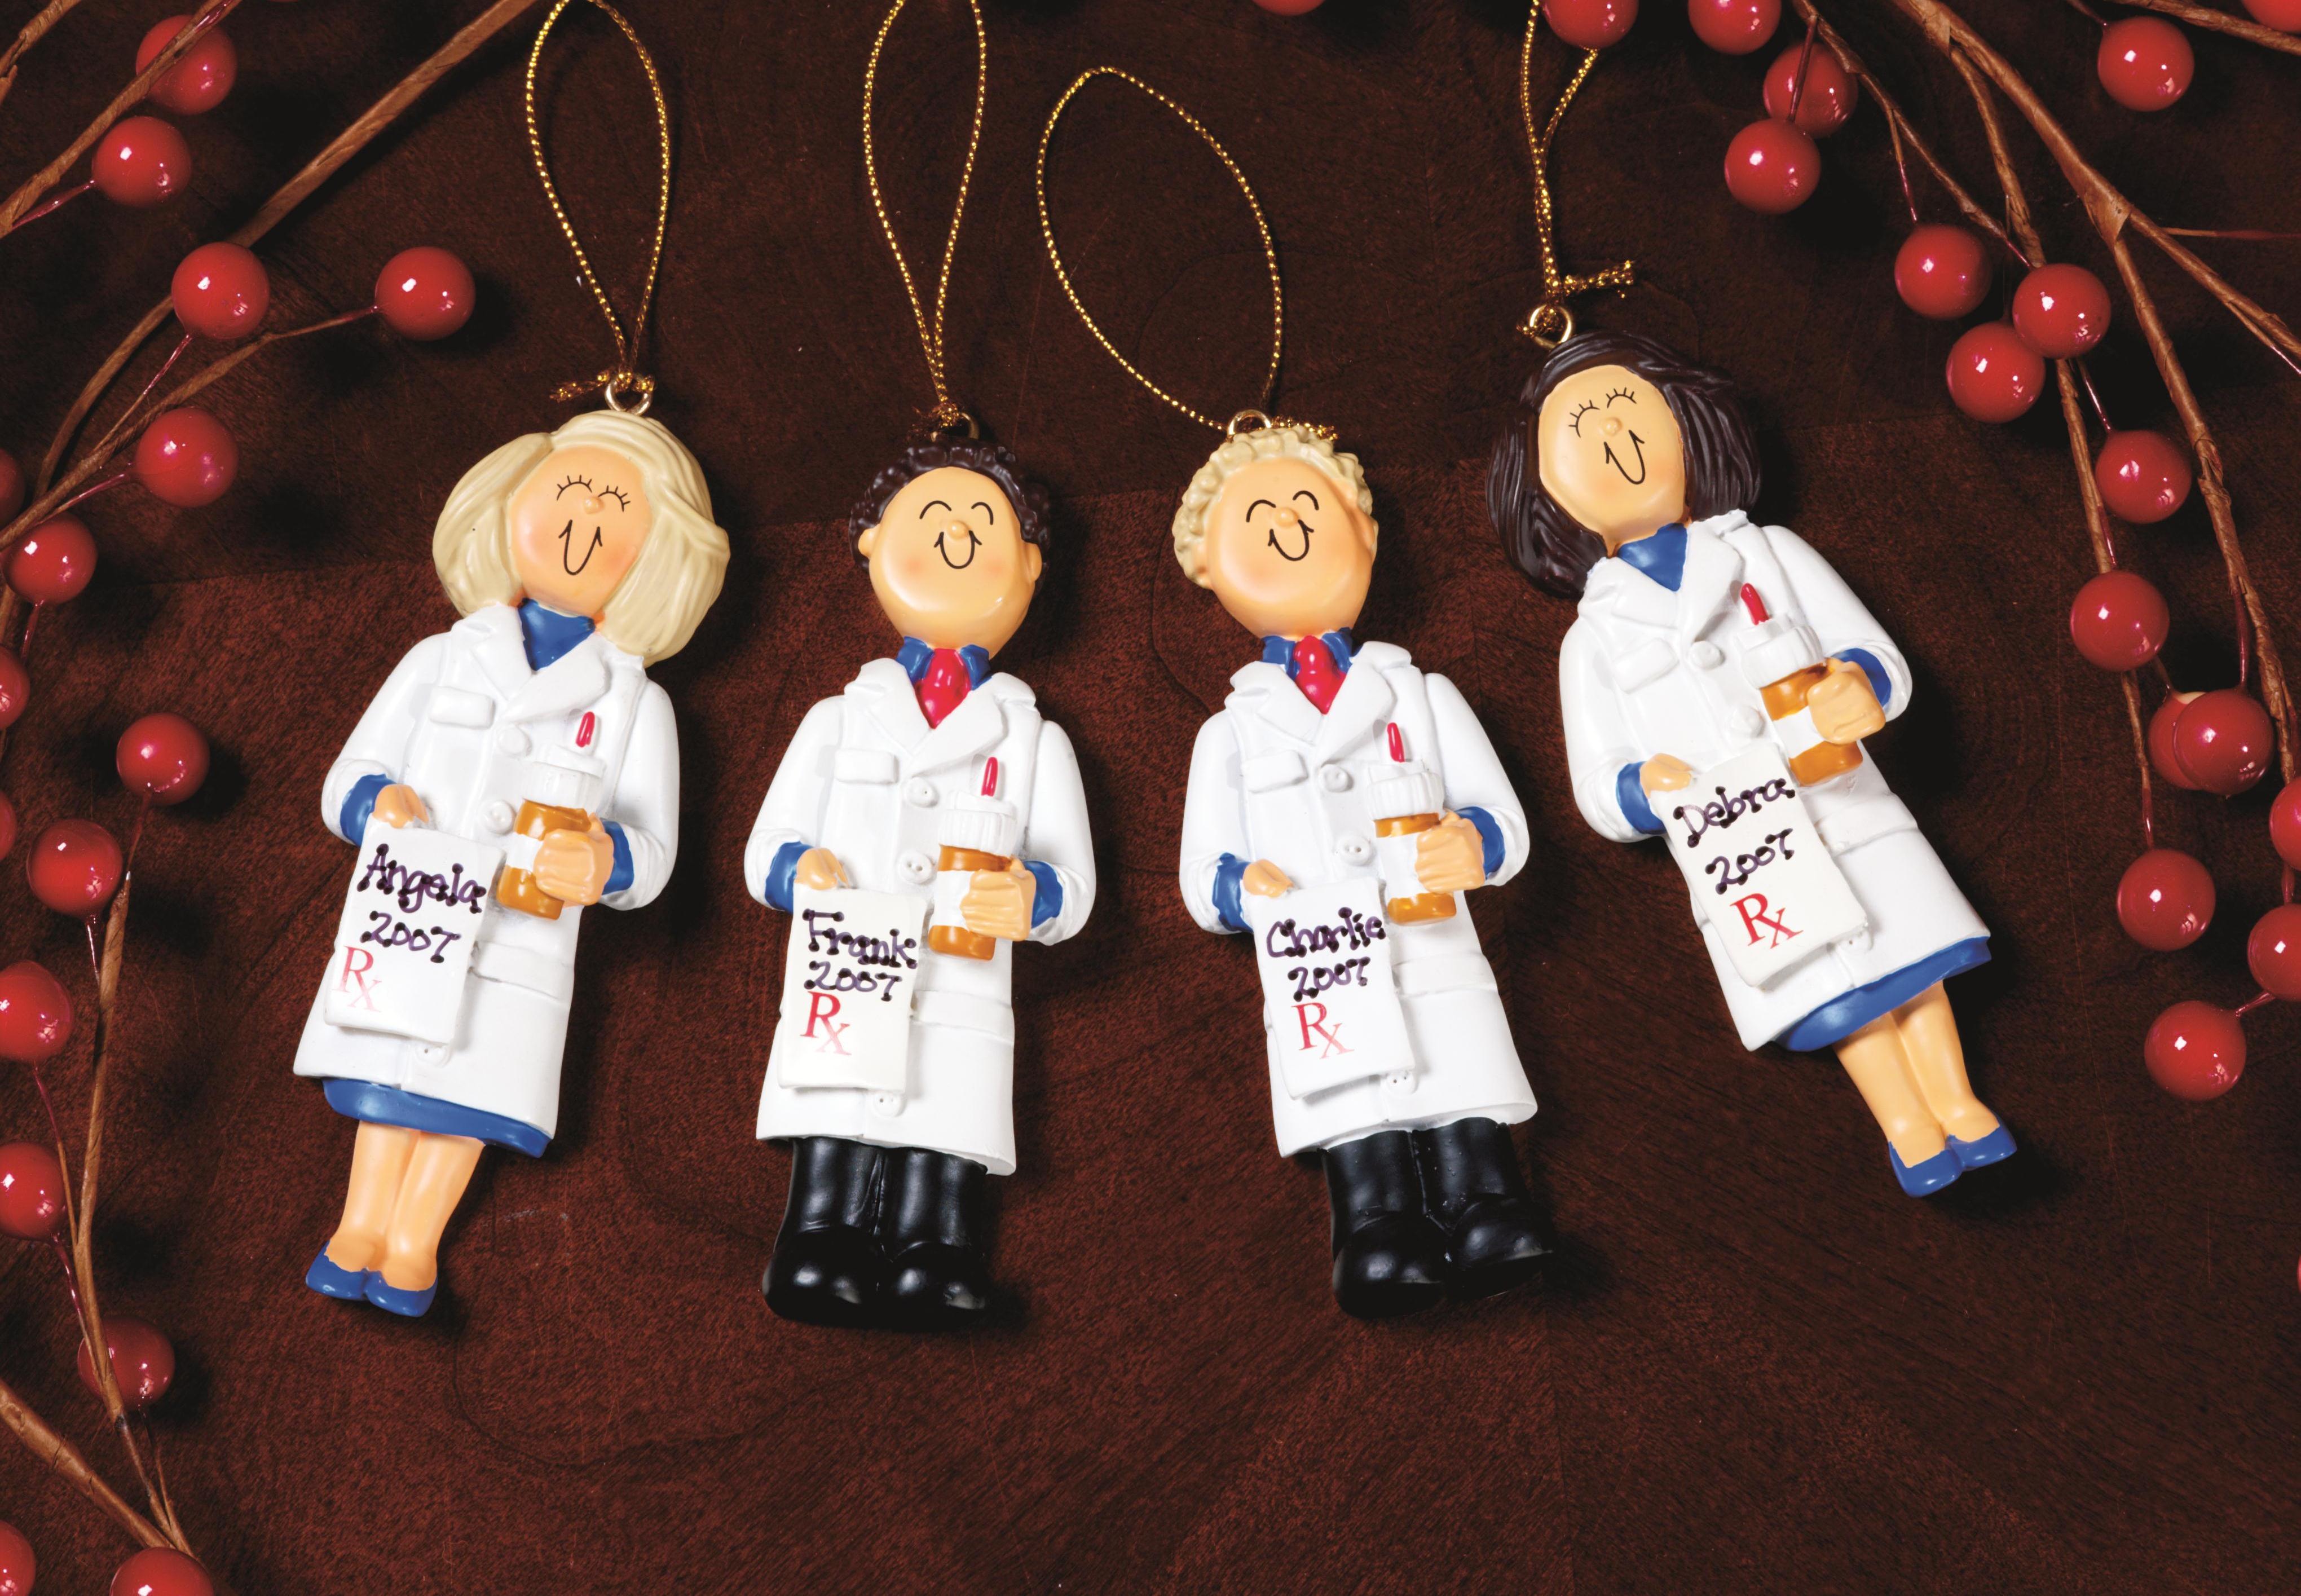 pk145 male blonde pharmacist ornament - Pharmacy Christmas Ornaments